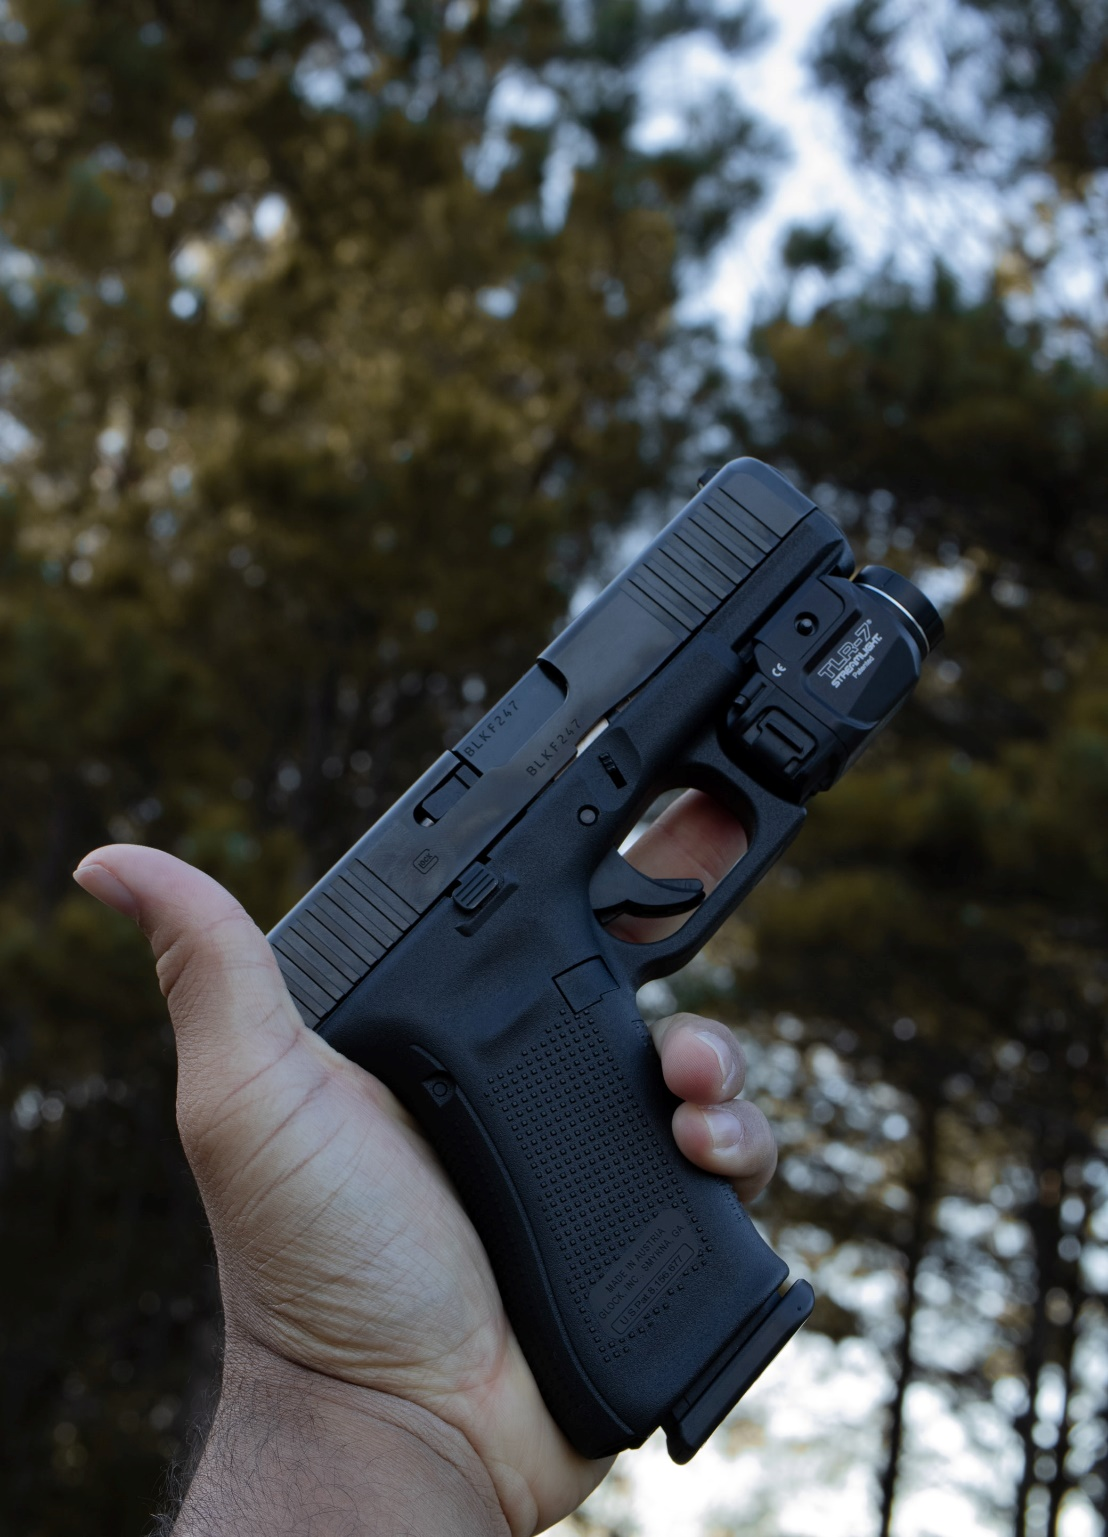 Holding a pistol